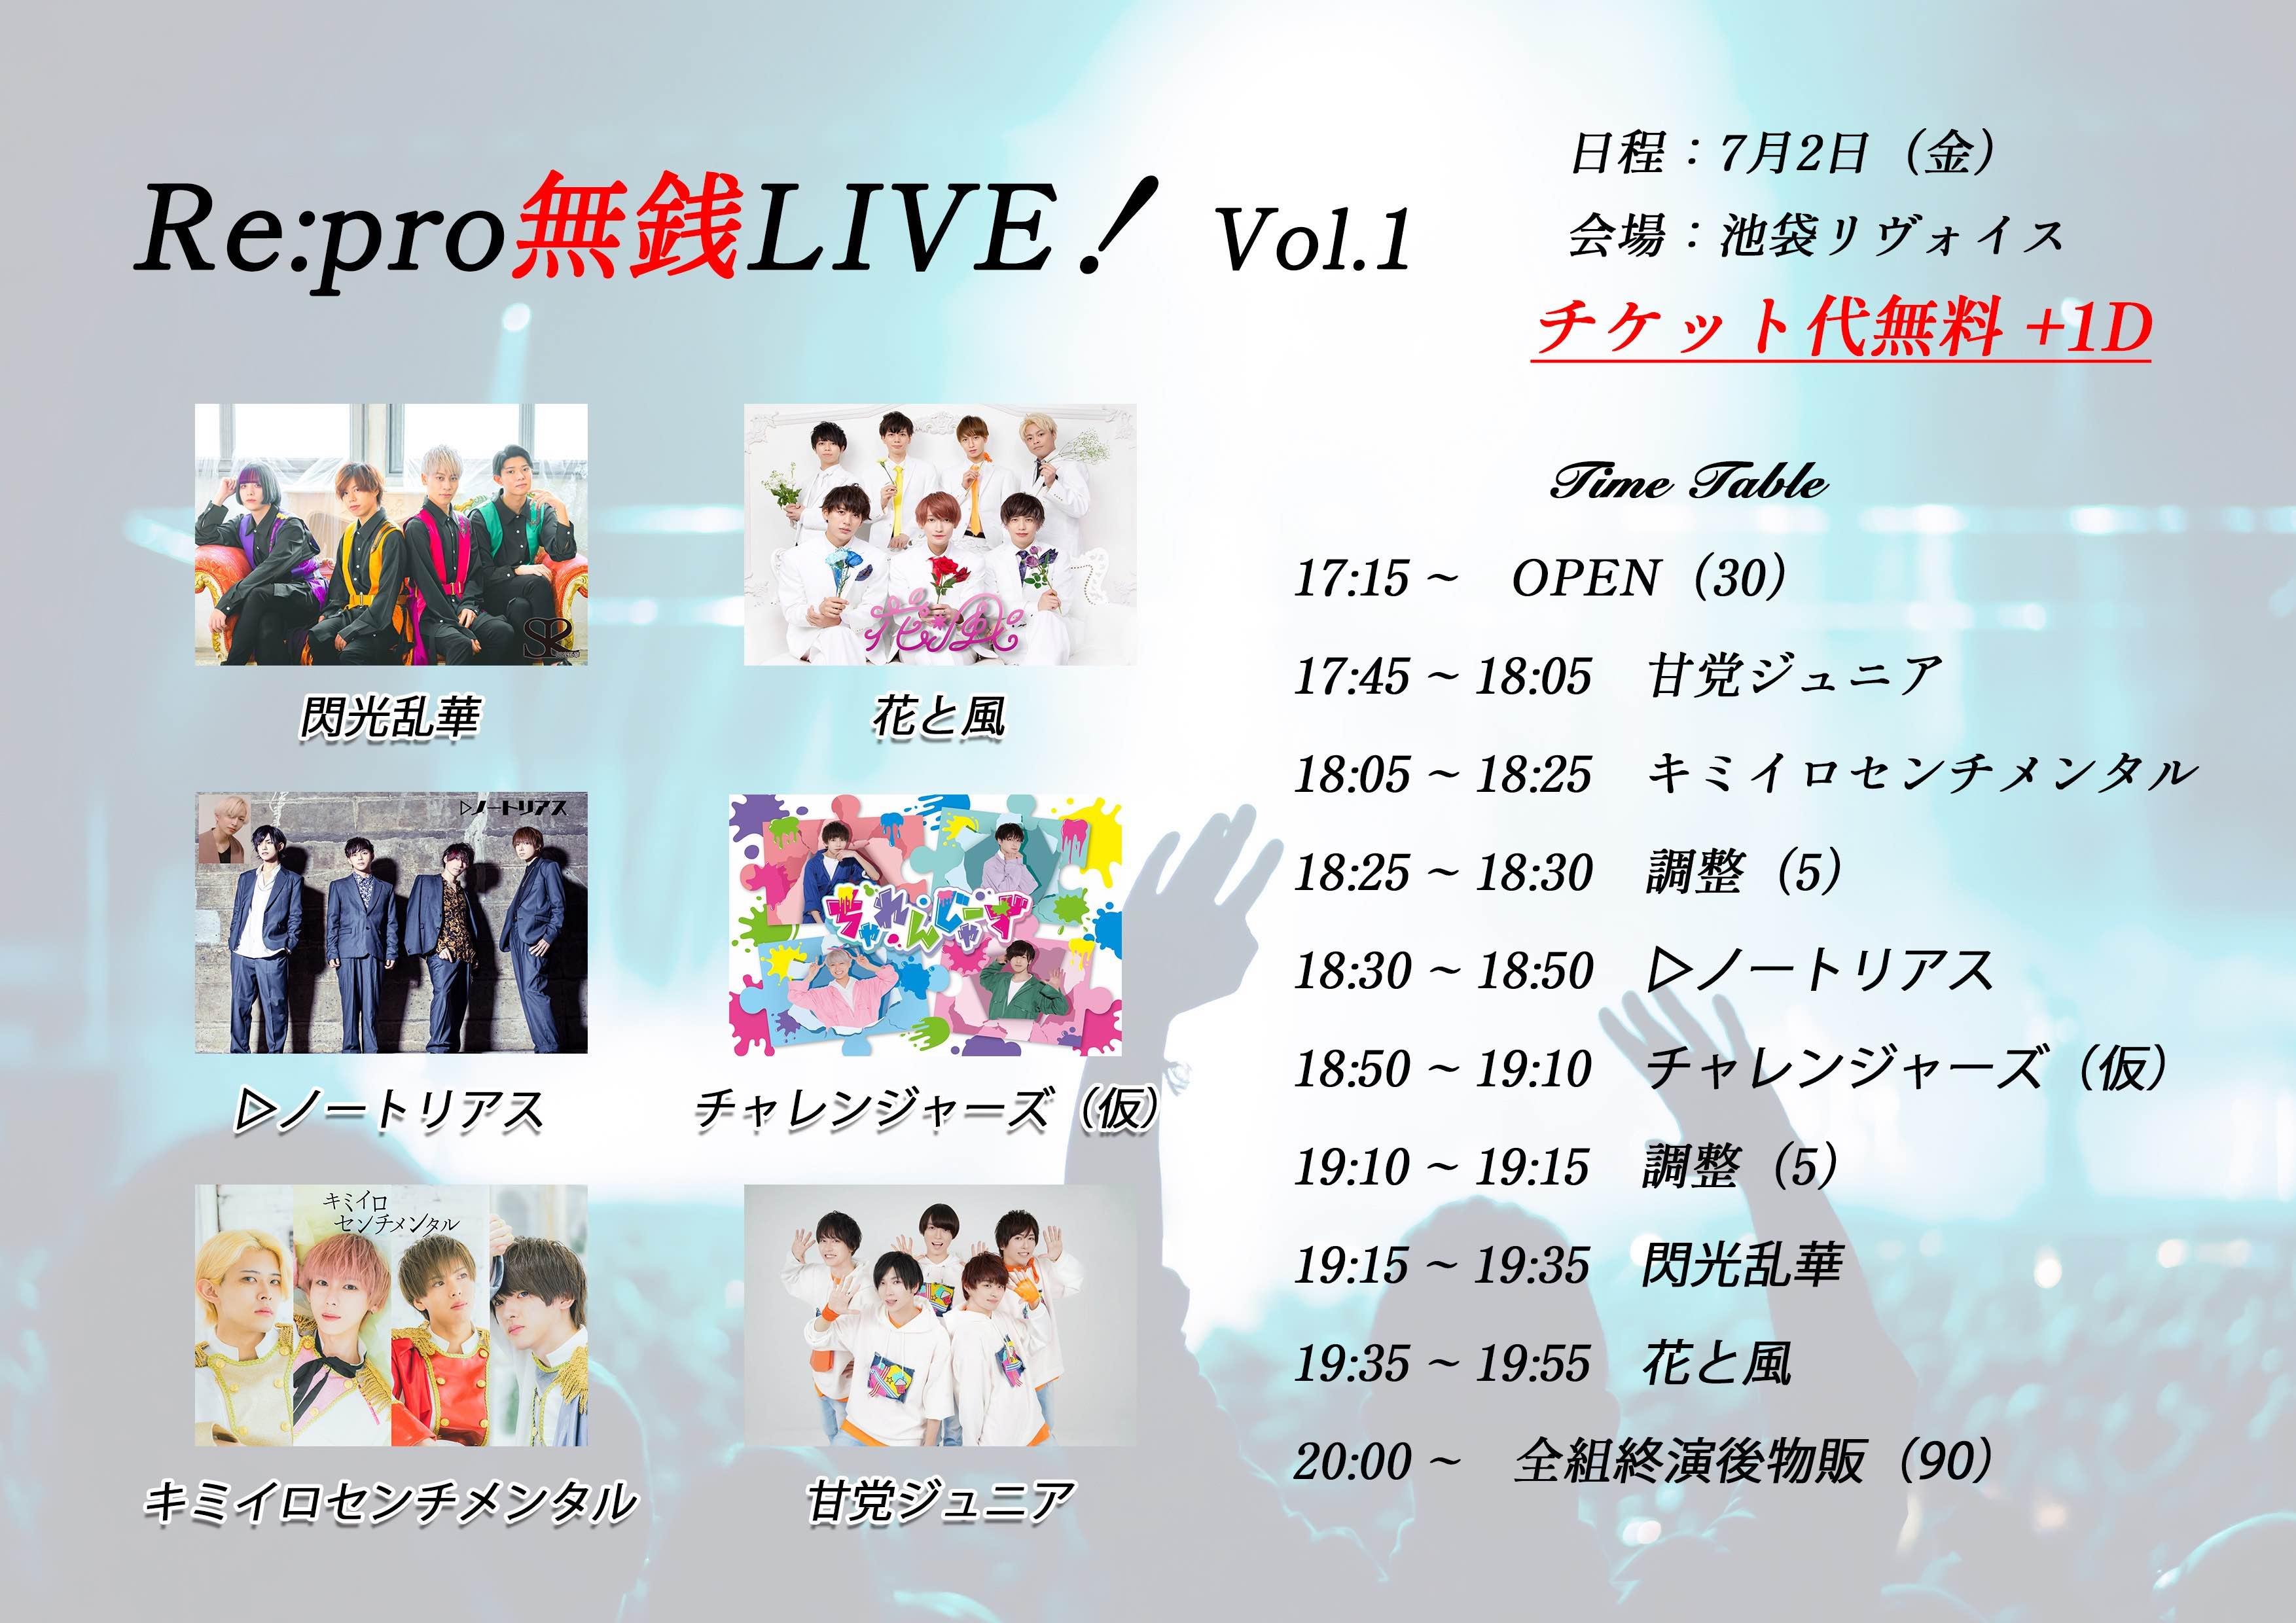 Re:pro無銭LIVE! Vol.1